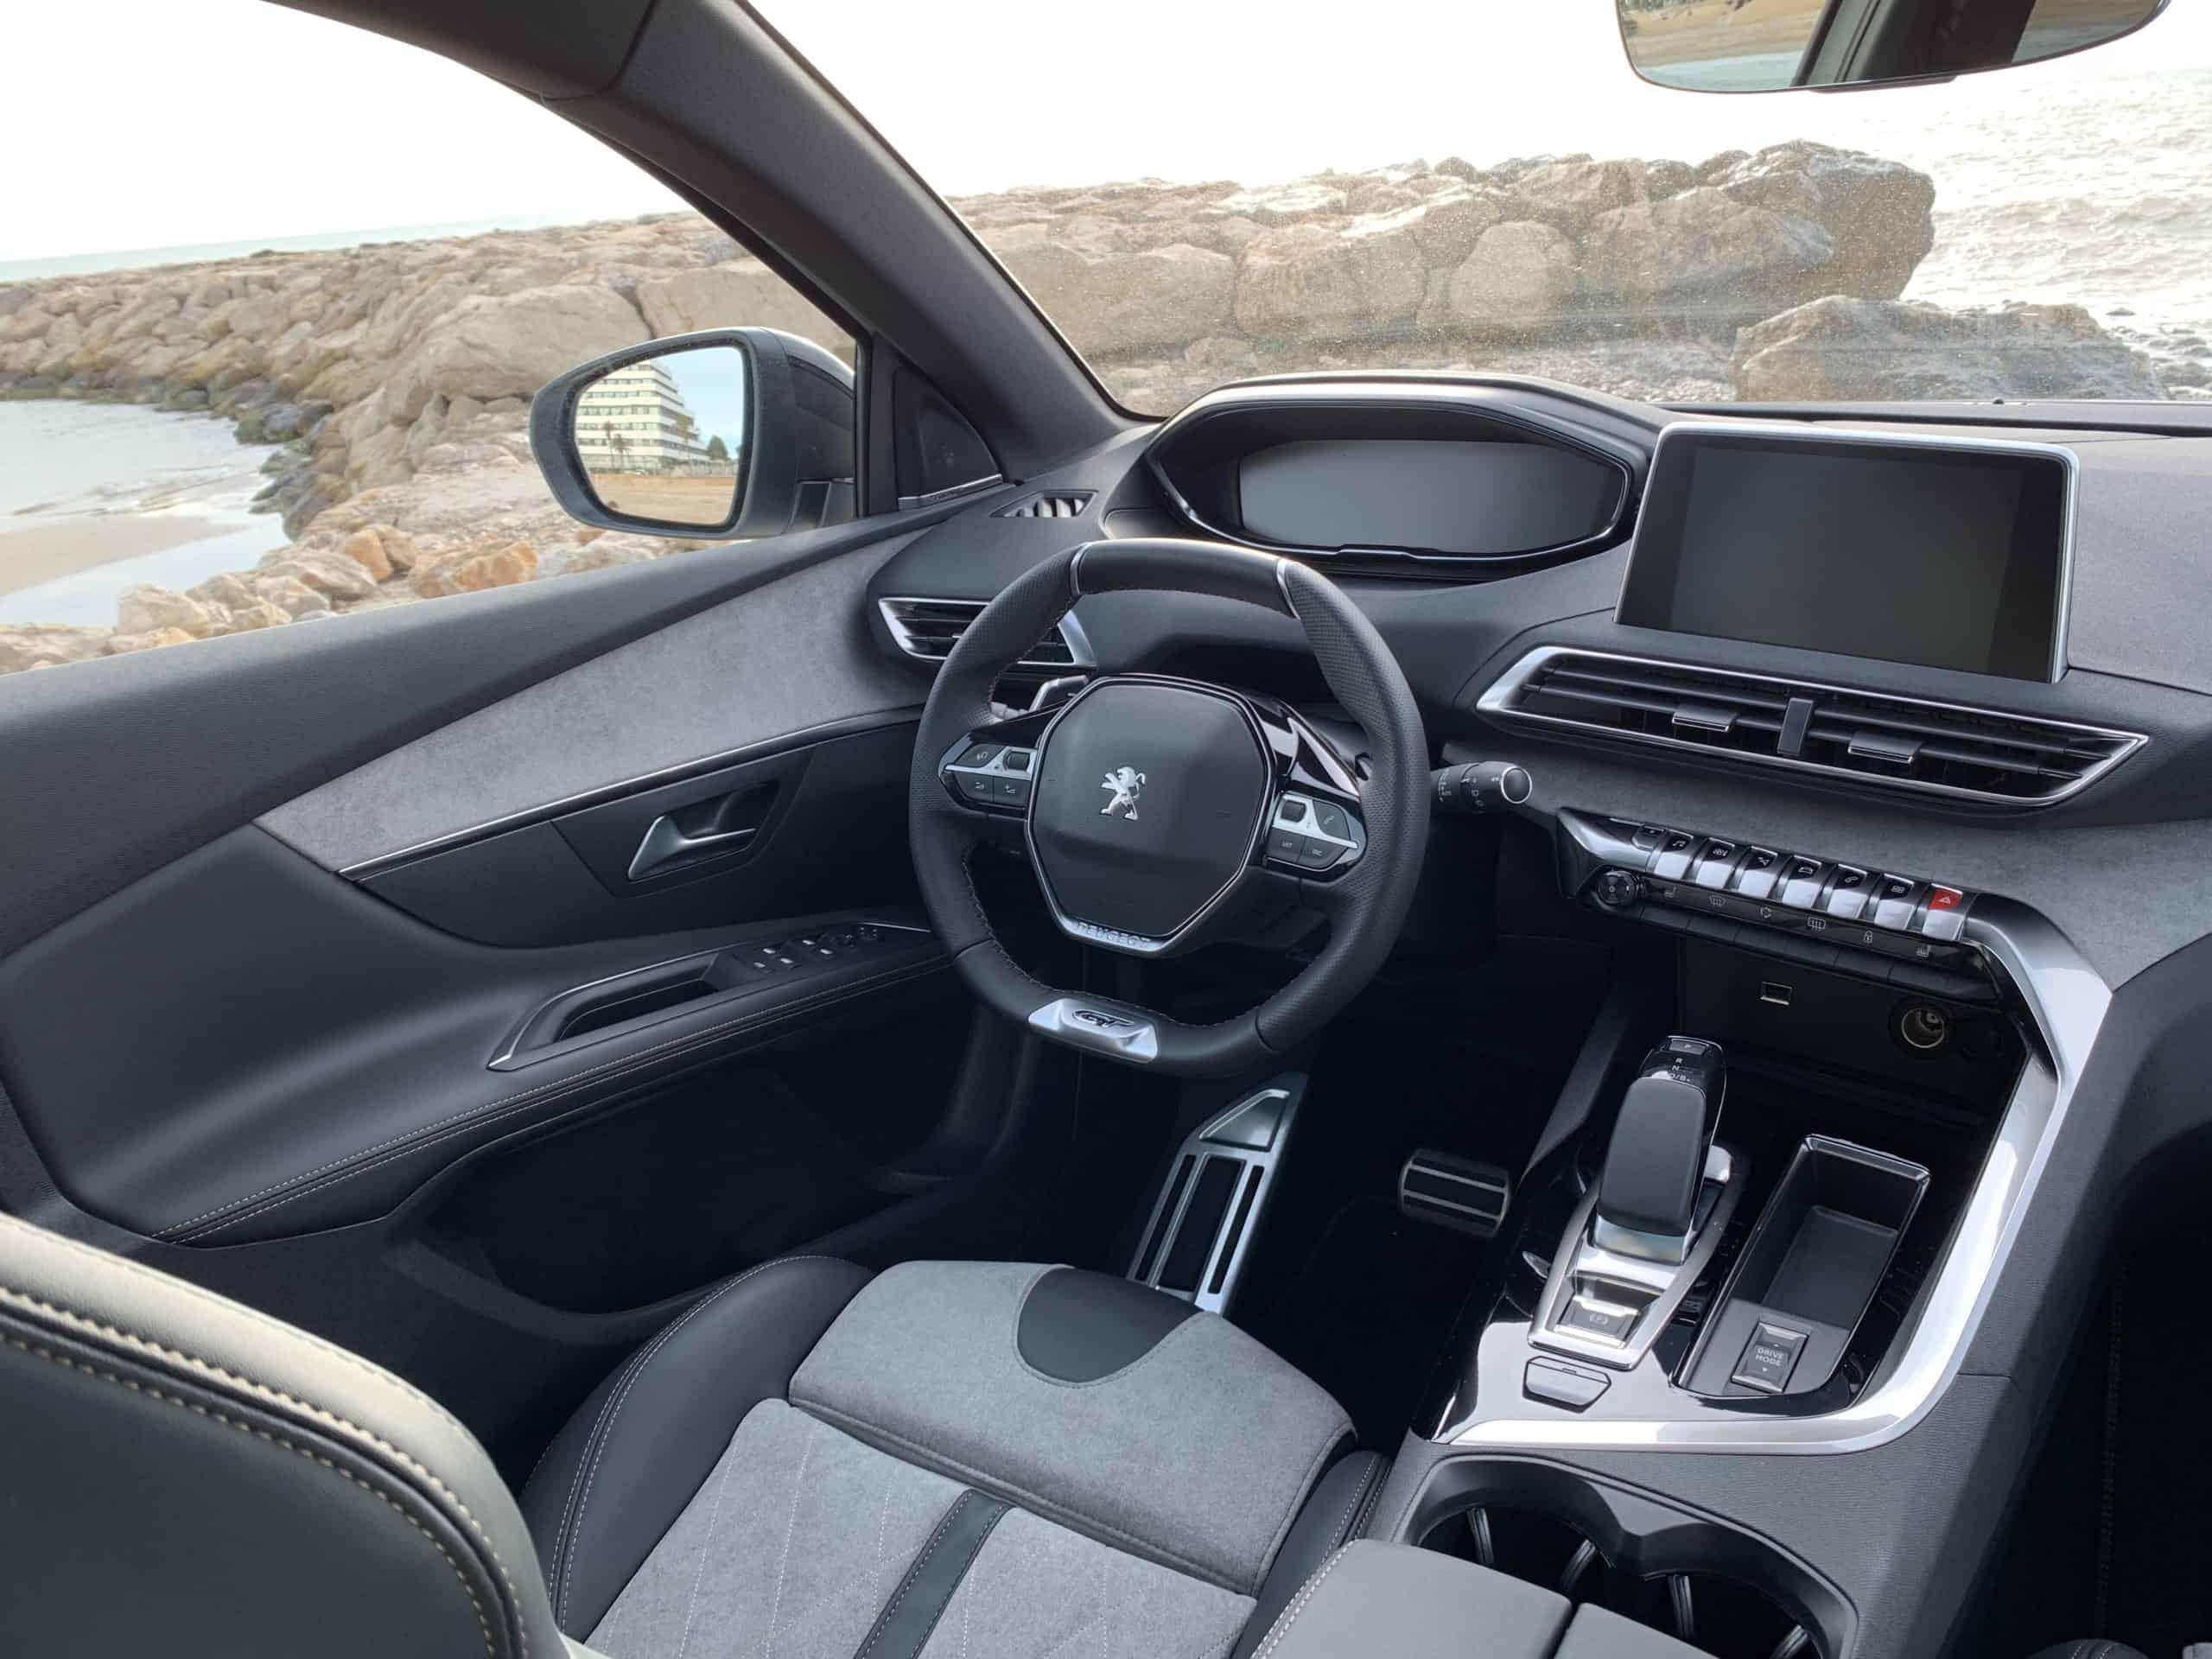 Peugeot 3008 Hybrid4, cockpit